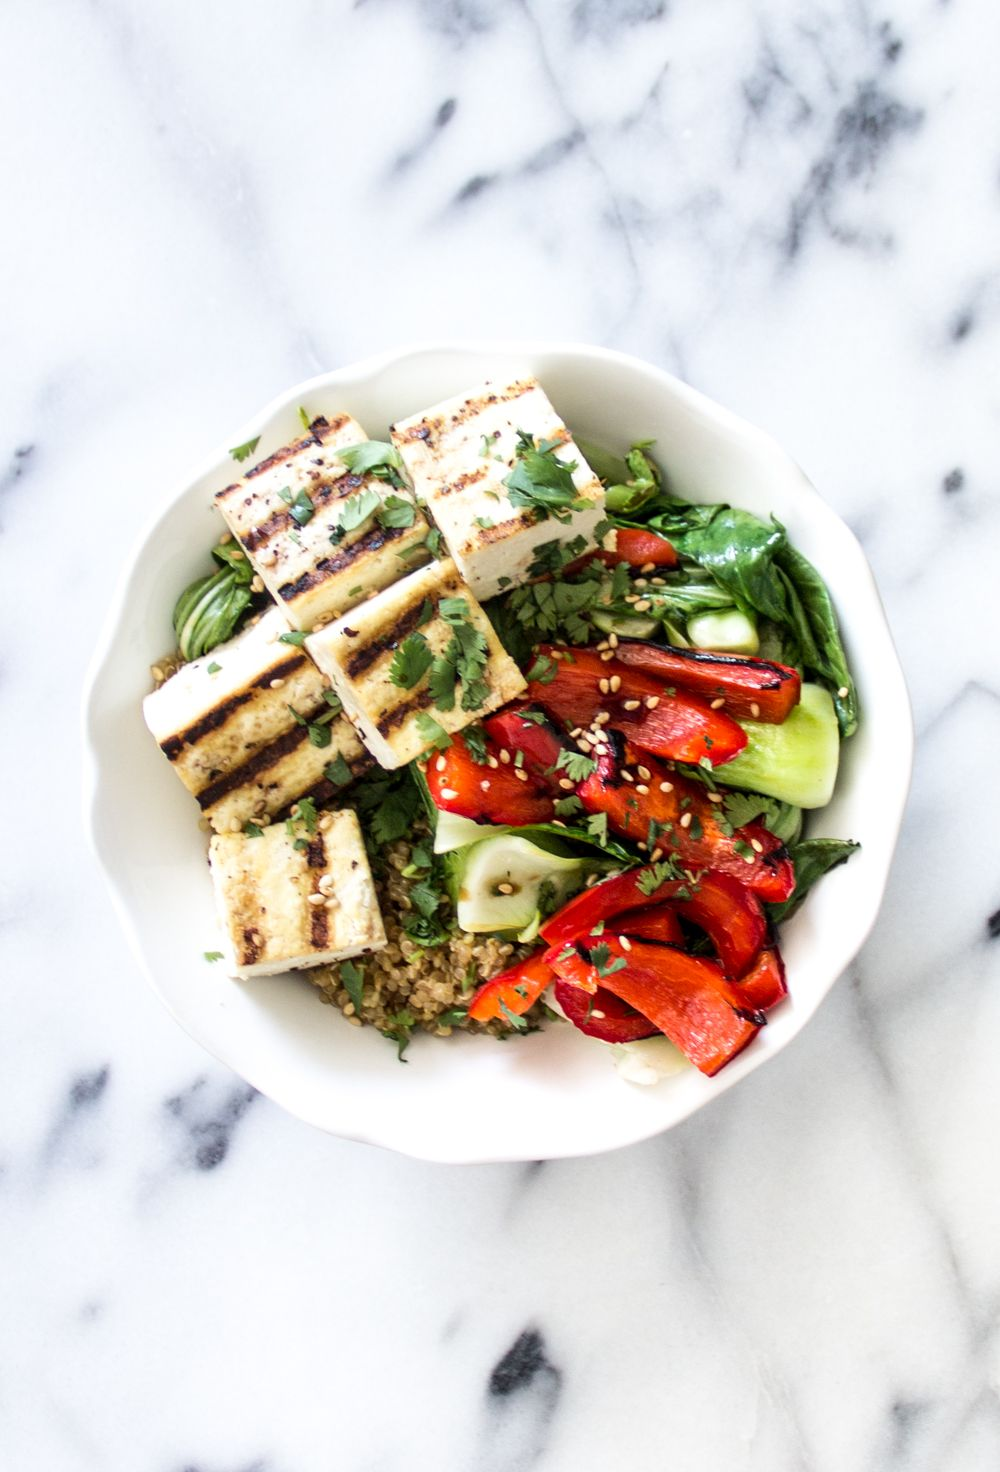 Soy Sauce Quinoa Bowl Tofu Recipes Food Recipes Grilled Tofu